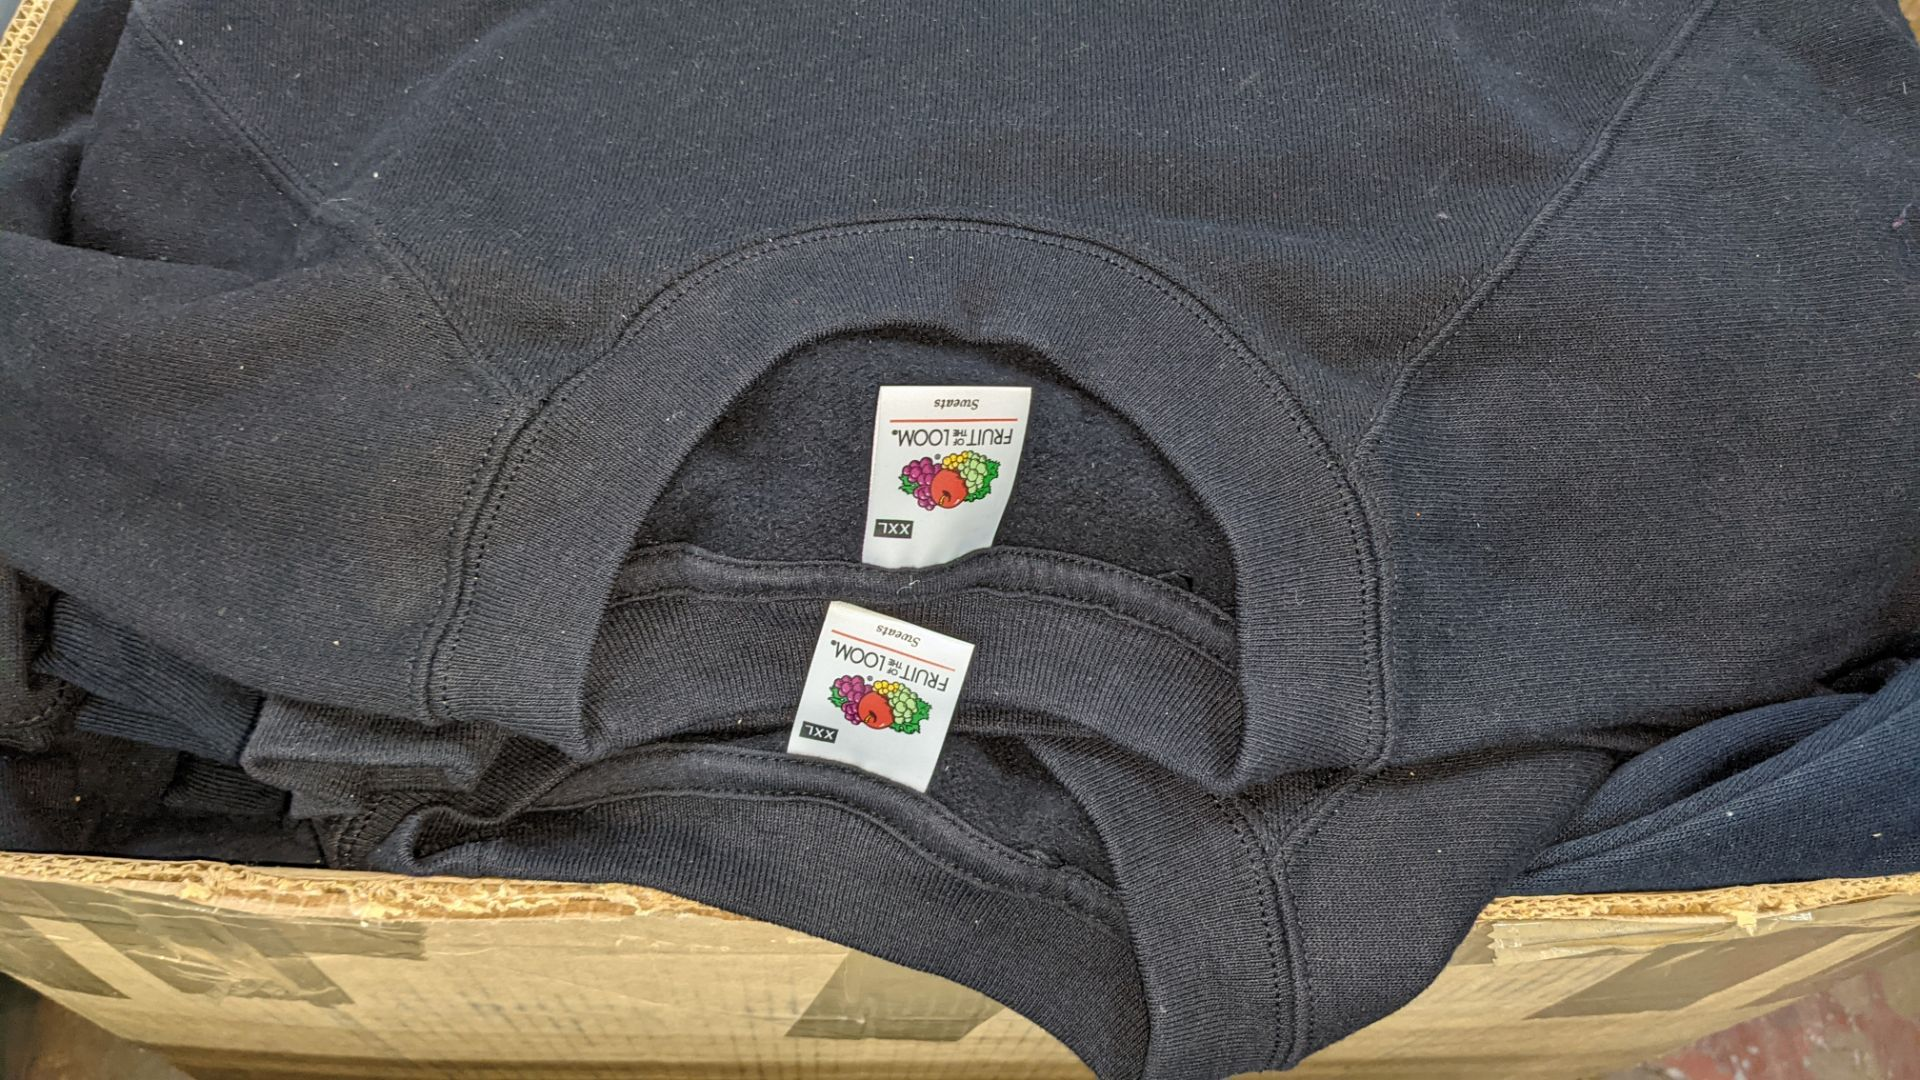 Quantity of black sweatshirts - 1 large box - Image 4 of 4